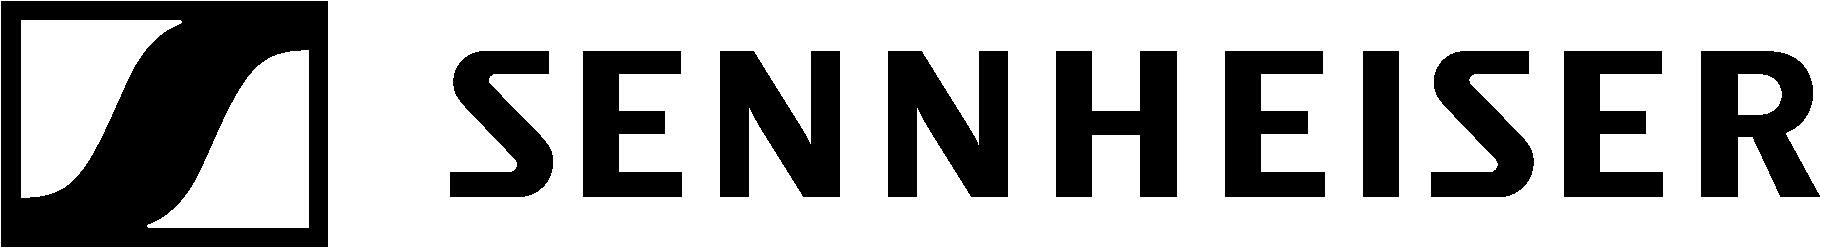 Sennheiser | Logopedia | FANDOM powered by Wikia